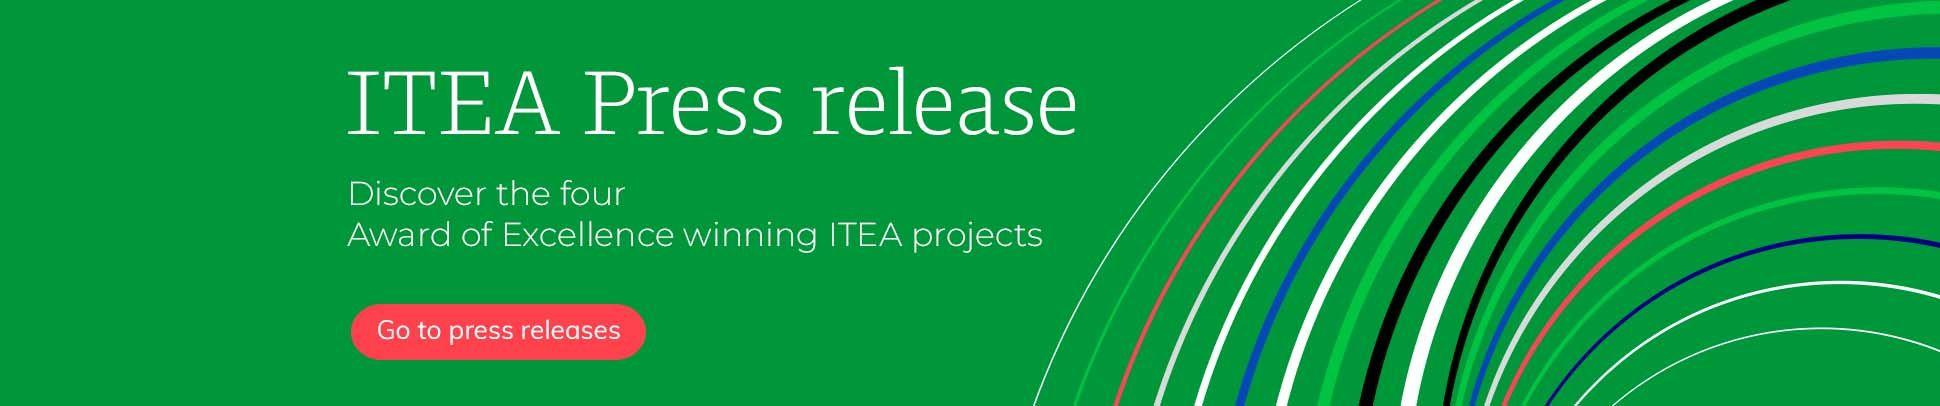 Jumbotron Press releases - ITEA Awards of Excellence 2021 - 1940x406.jpg